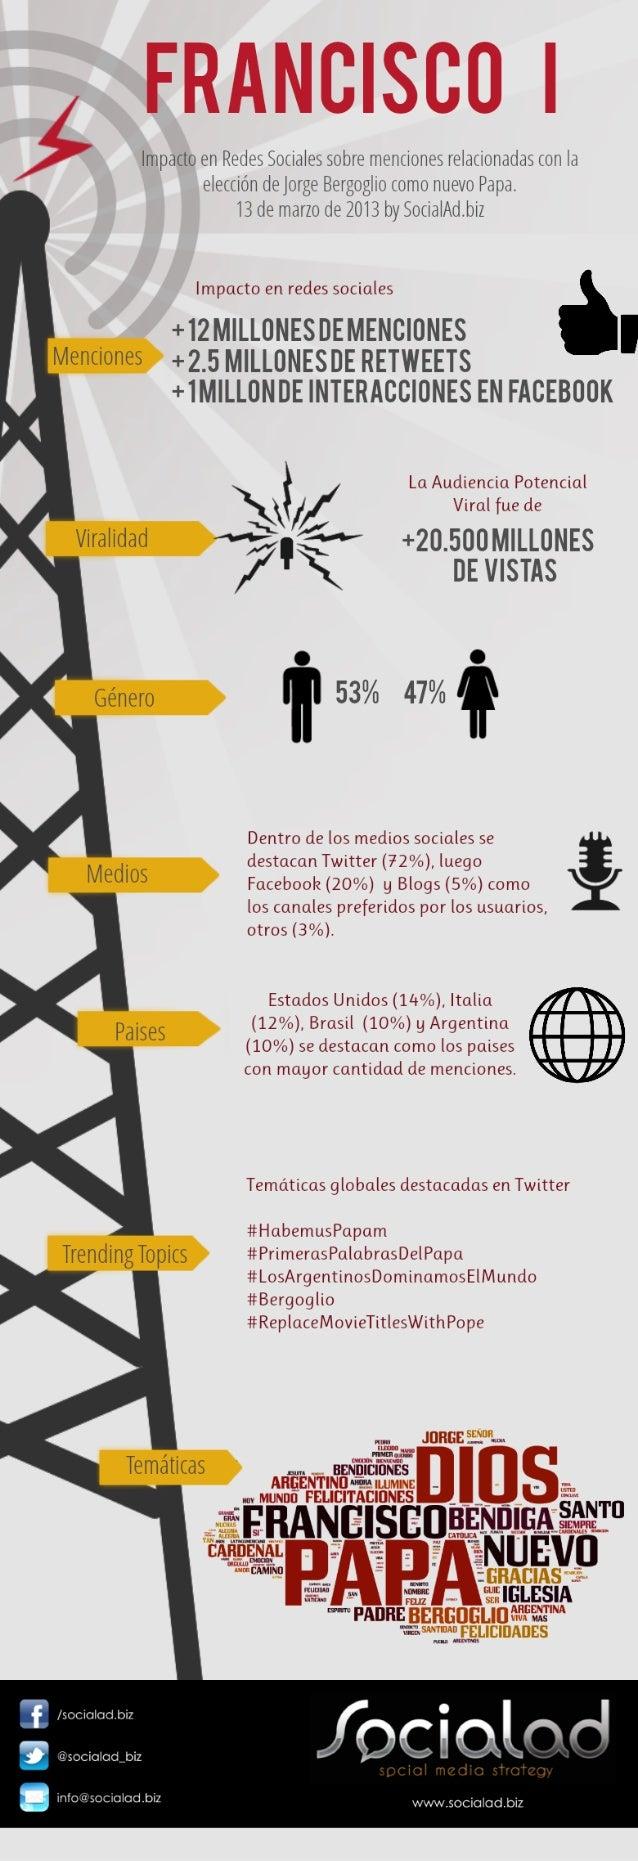 FRANCISCO I. Jorge Bergoglio Papa. Impacto en Redes Sociales. Reporte SocialAd.biz